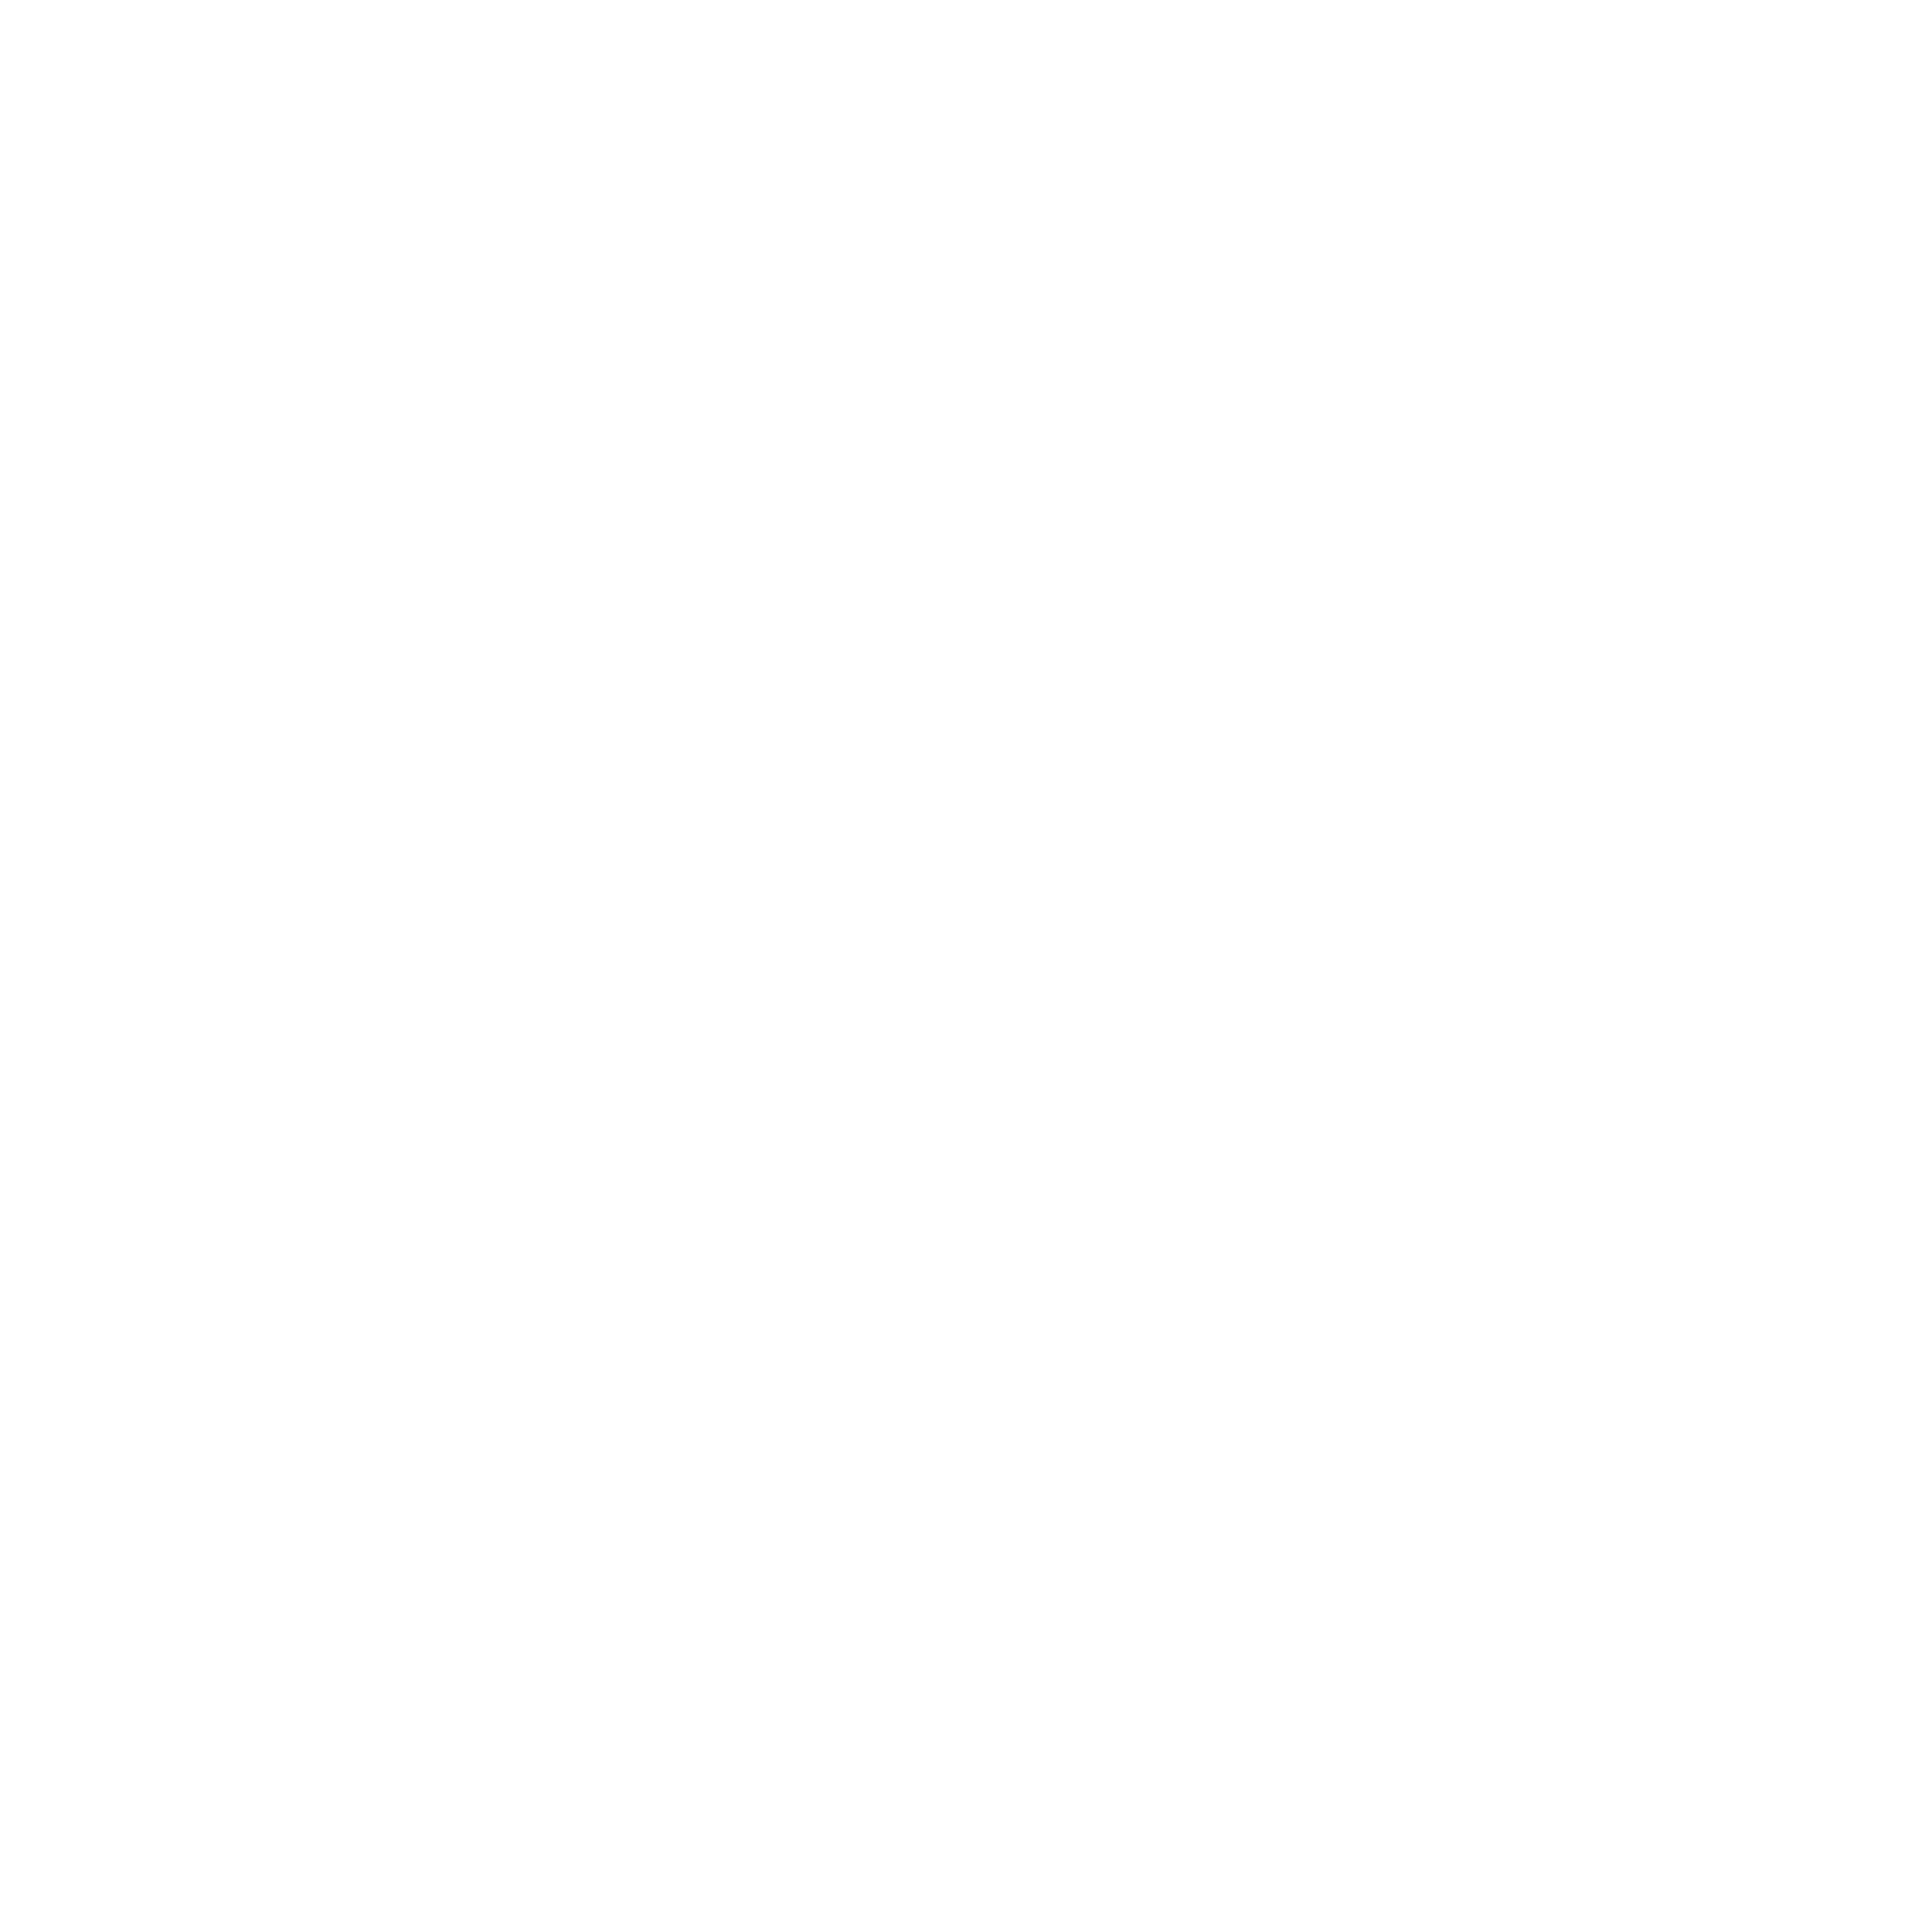 Logo United Arab Emirates Clipart Full Size Clipart 1245268 Pinclipart